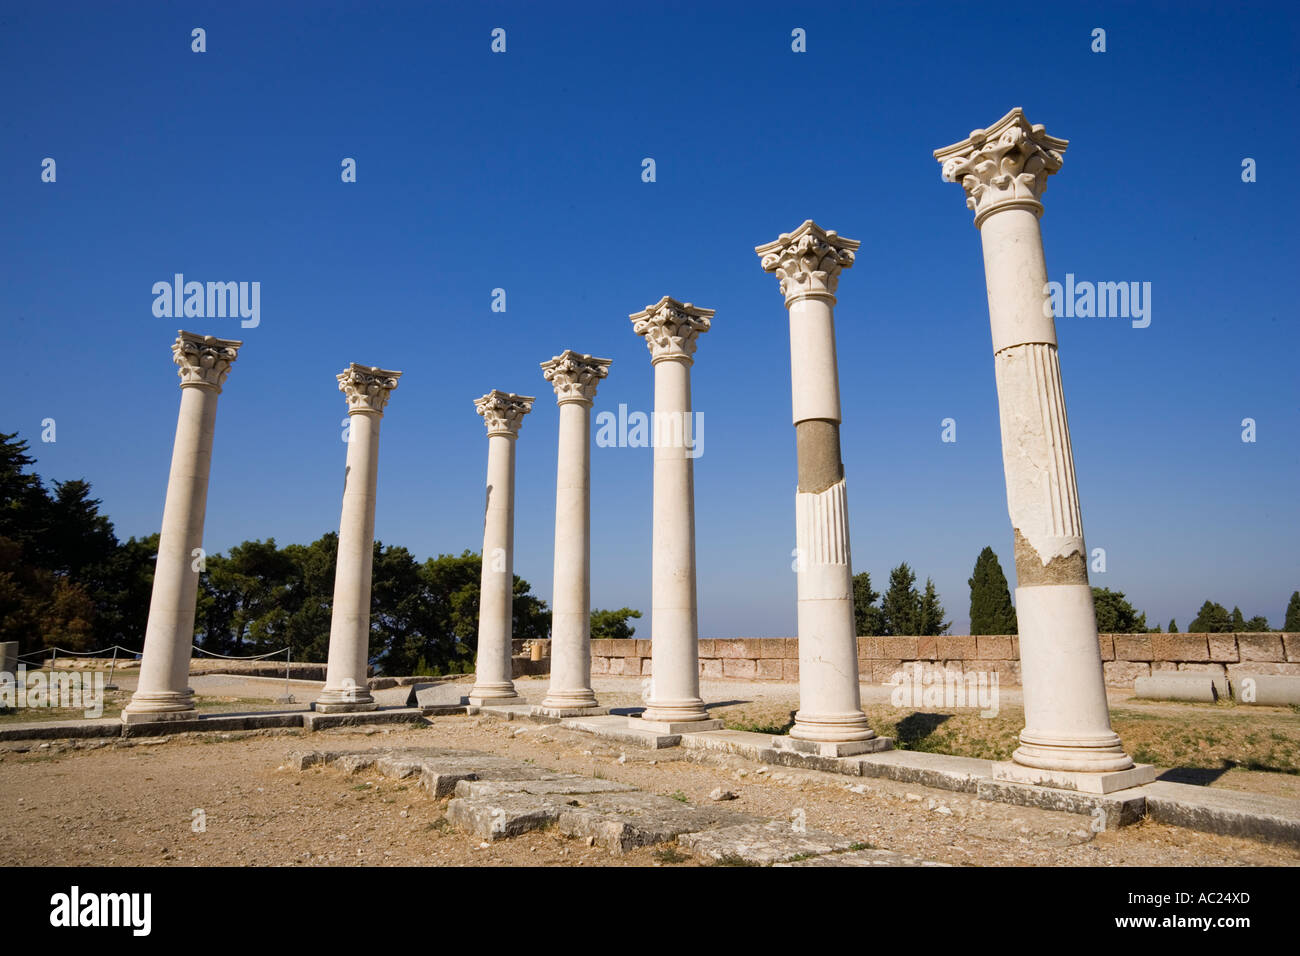 Group of ionic columns of the temple Asklipieion Kos Town Kos Greece Stock Photo